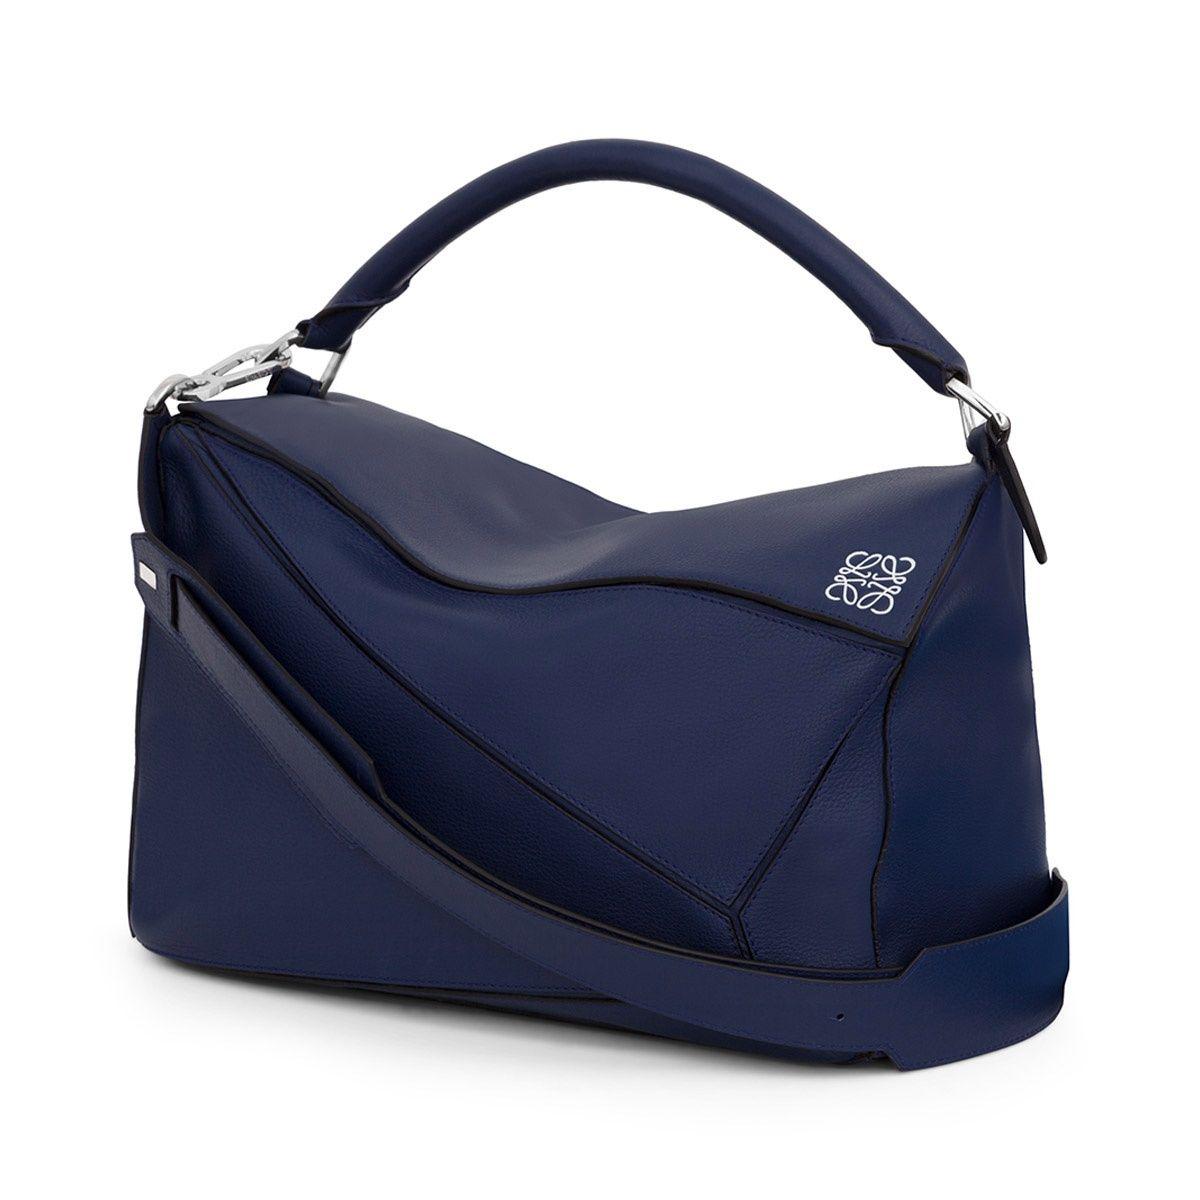 Top Handle Handbag On Sale, Blue Marine, Leather, 2017, one size Loewe